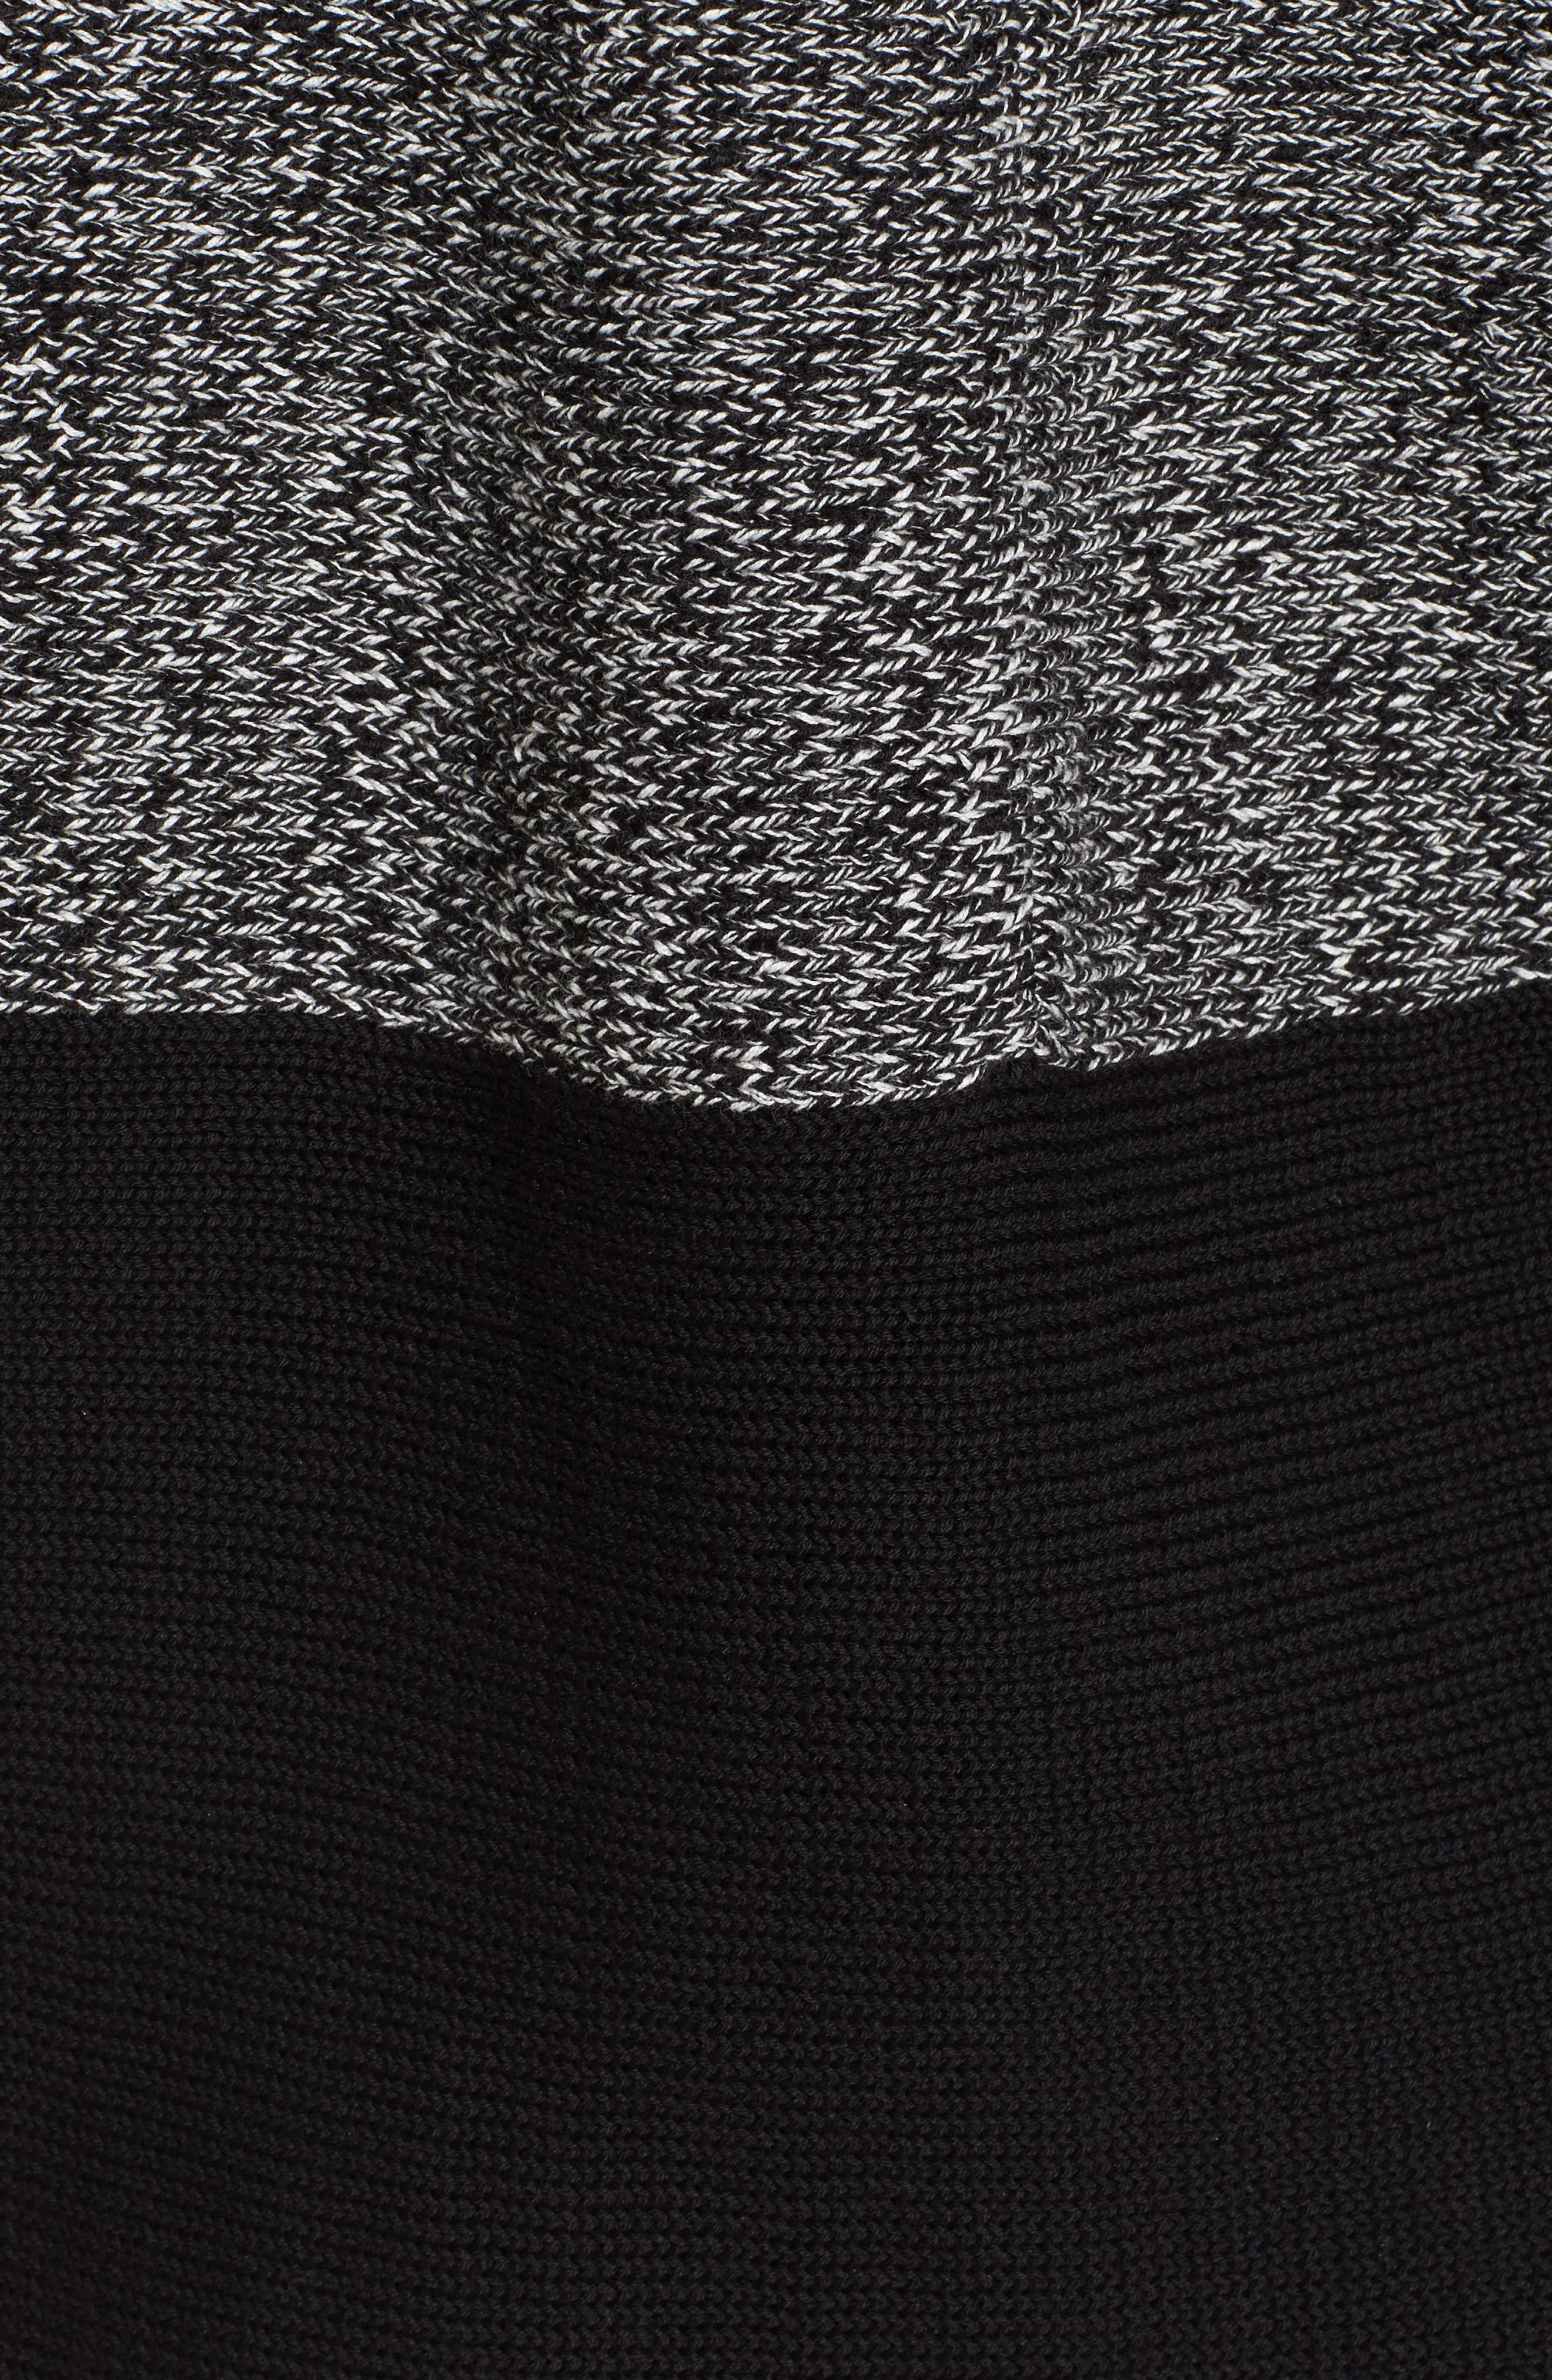 Colorblock Kimono Sleeve Sweater,                             Alternate thumbnail 5, color,                             Rich Black